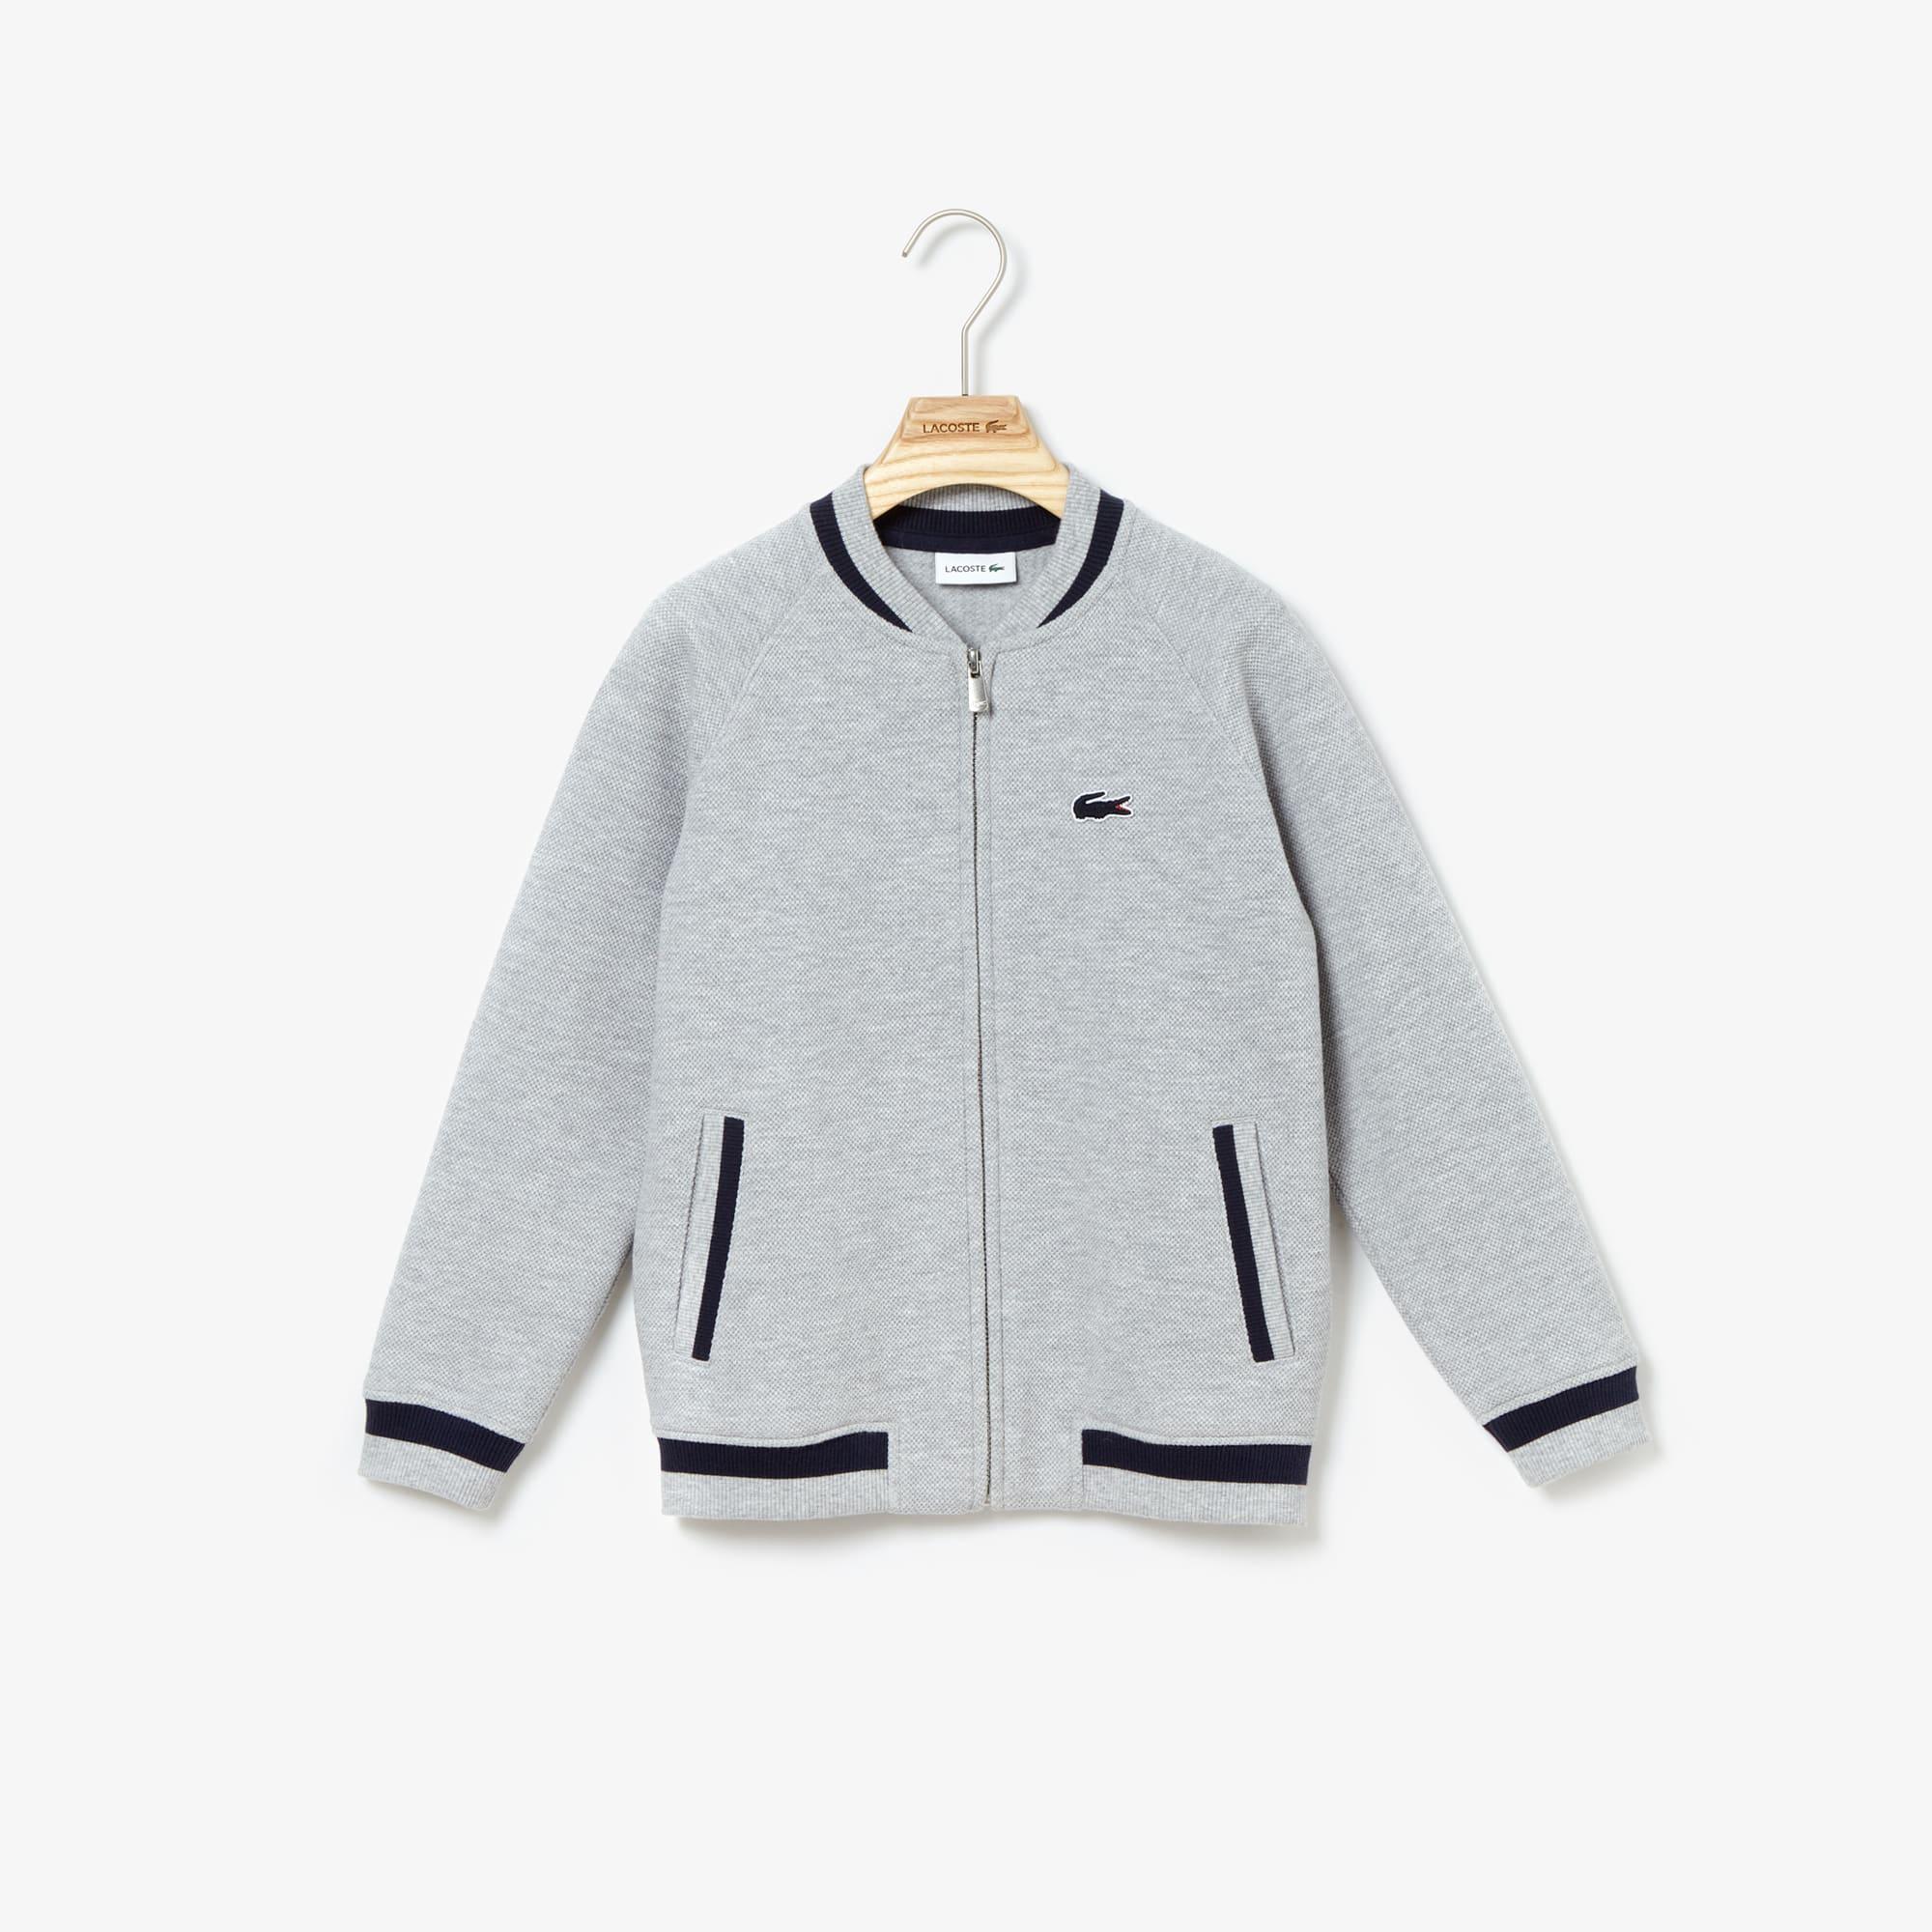 Boys' Teddy Neck Contrast Stripes Fleece Sweatshirt